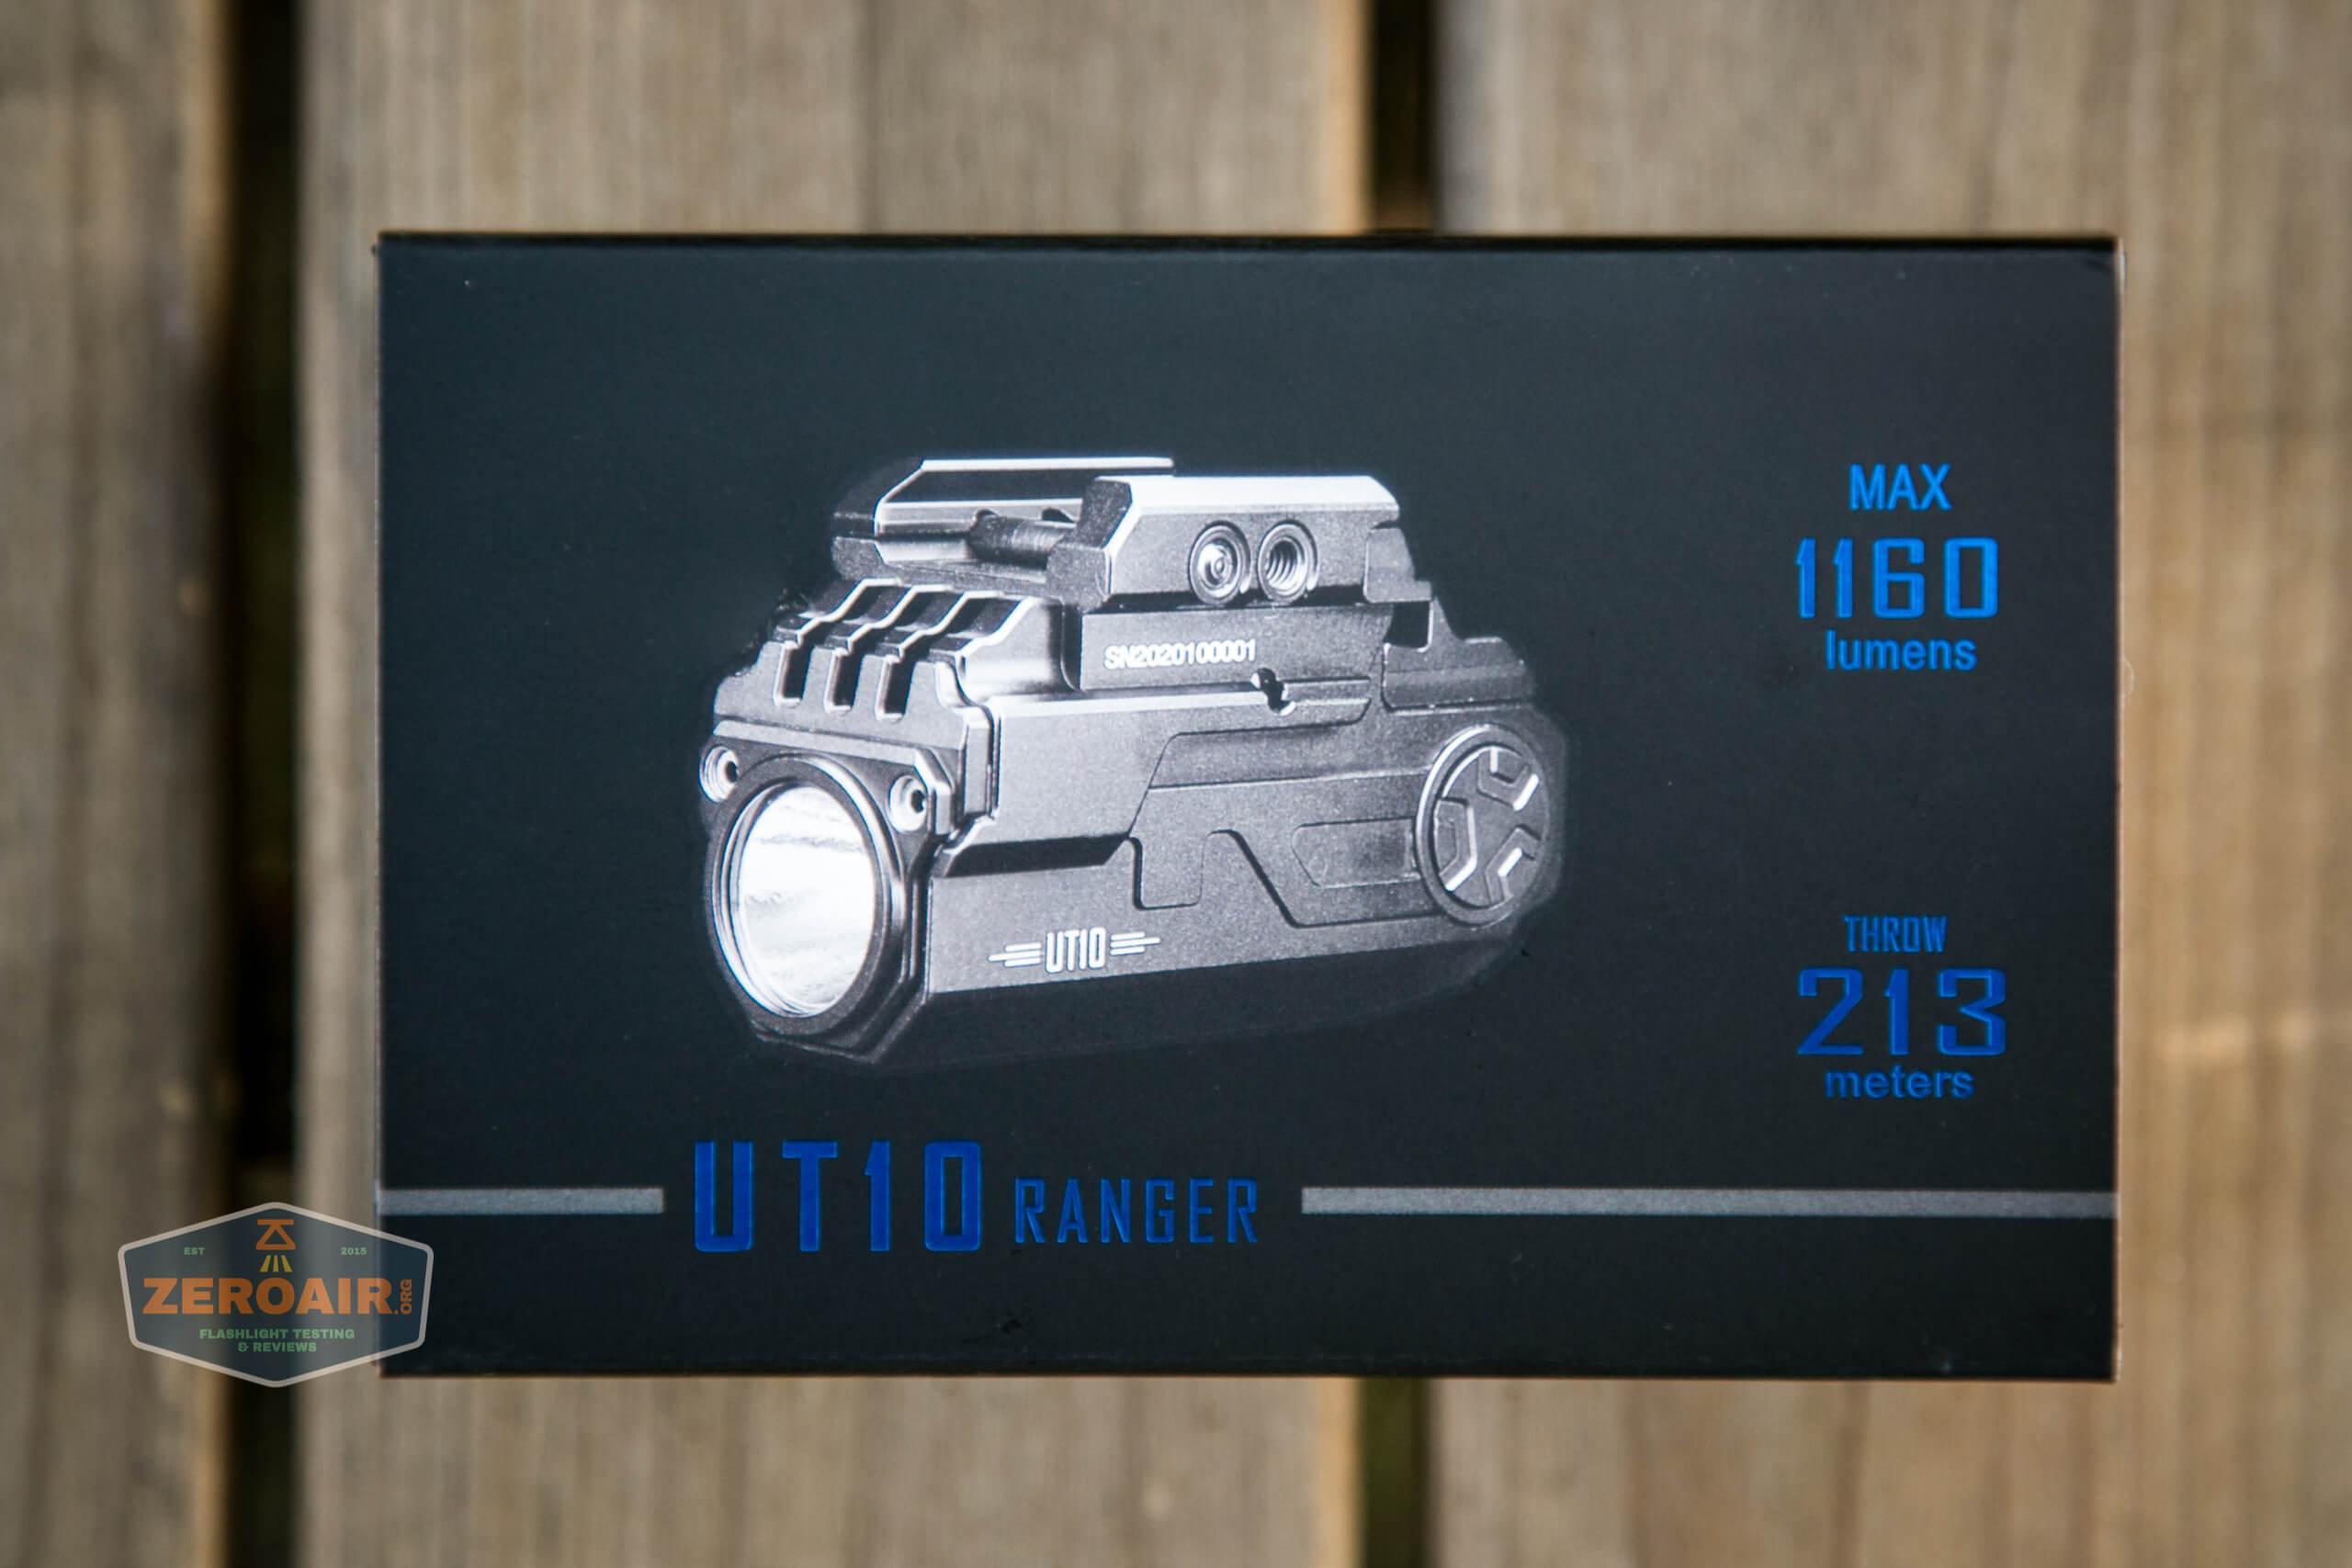 imalent ut10 tactical weapon flashlight box